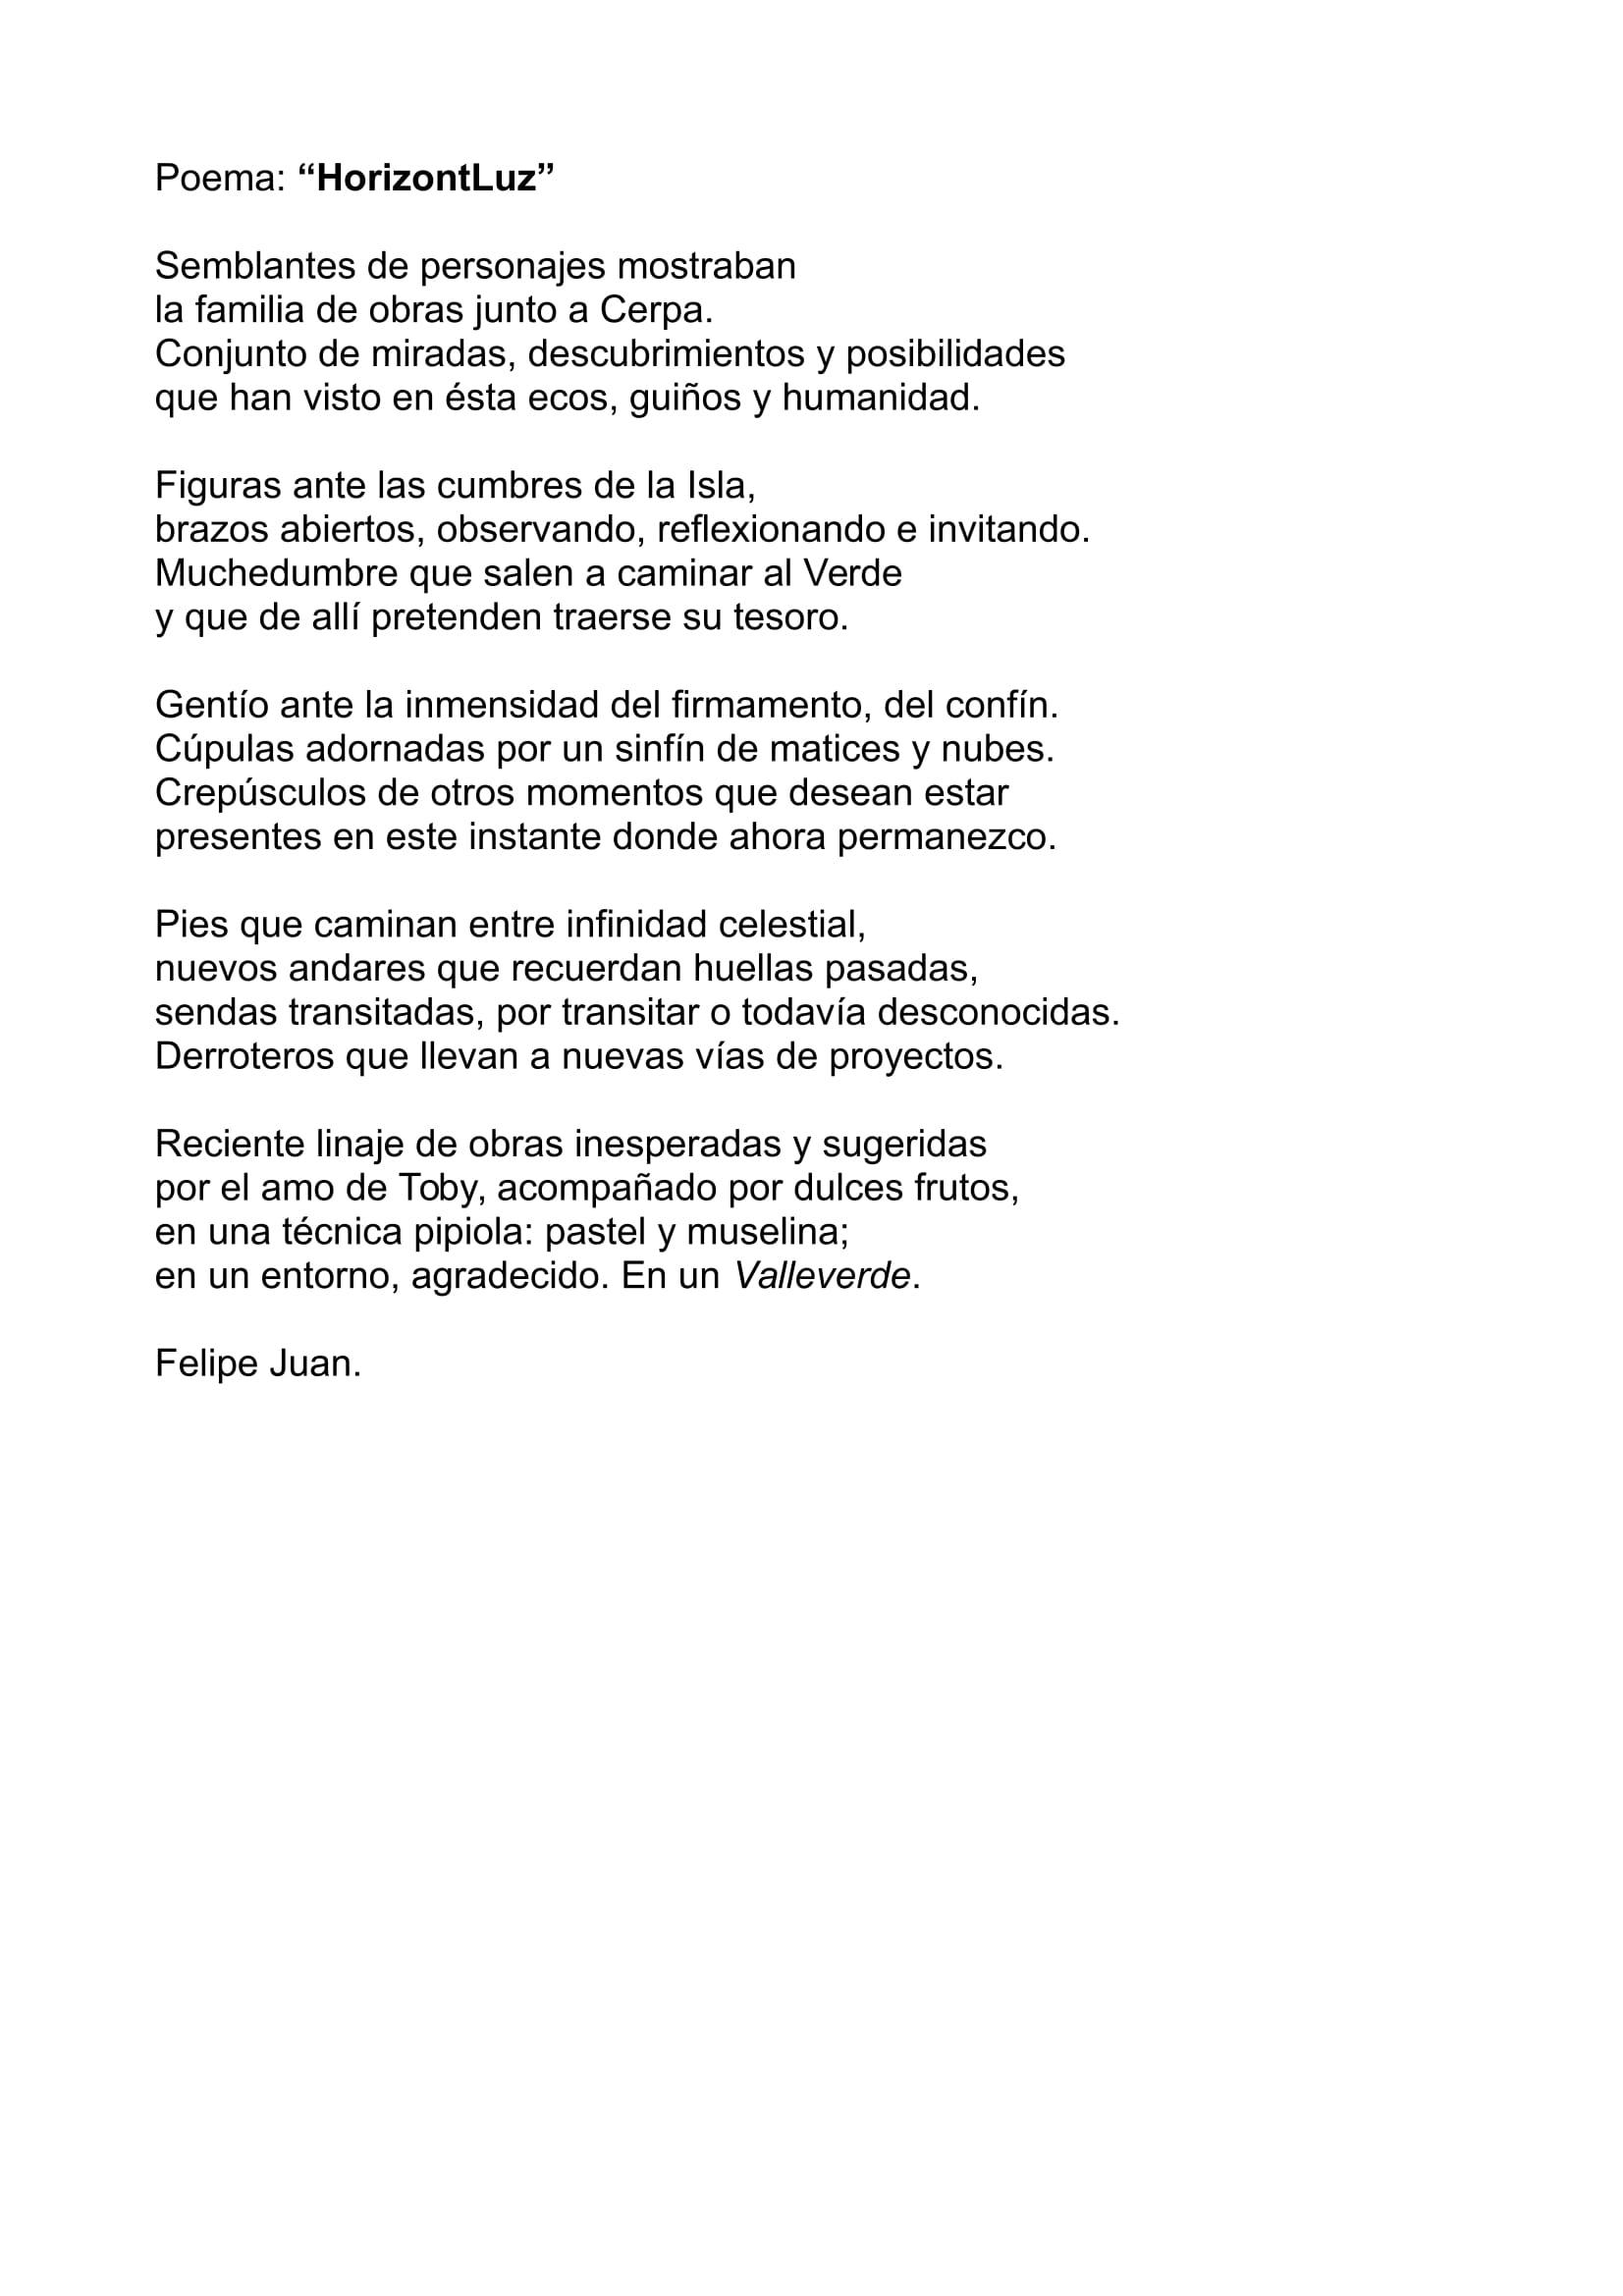 18_Exposición_HorizontLuz_Poema_Felipe_J